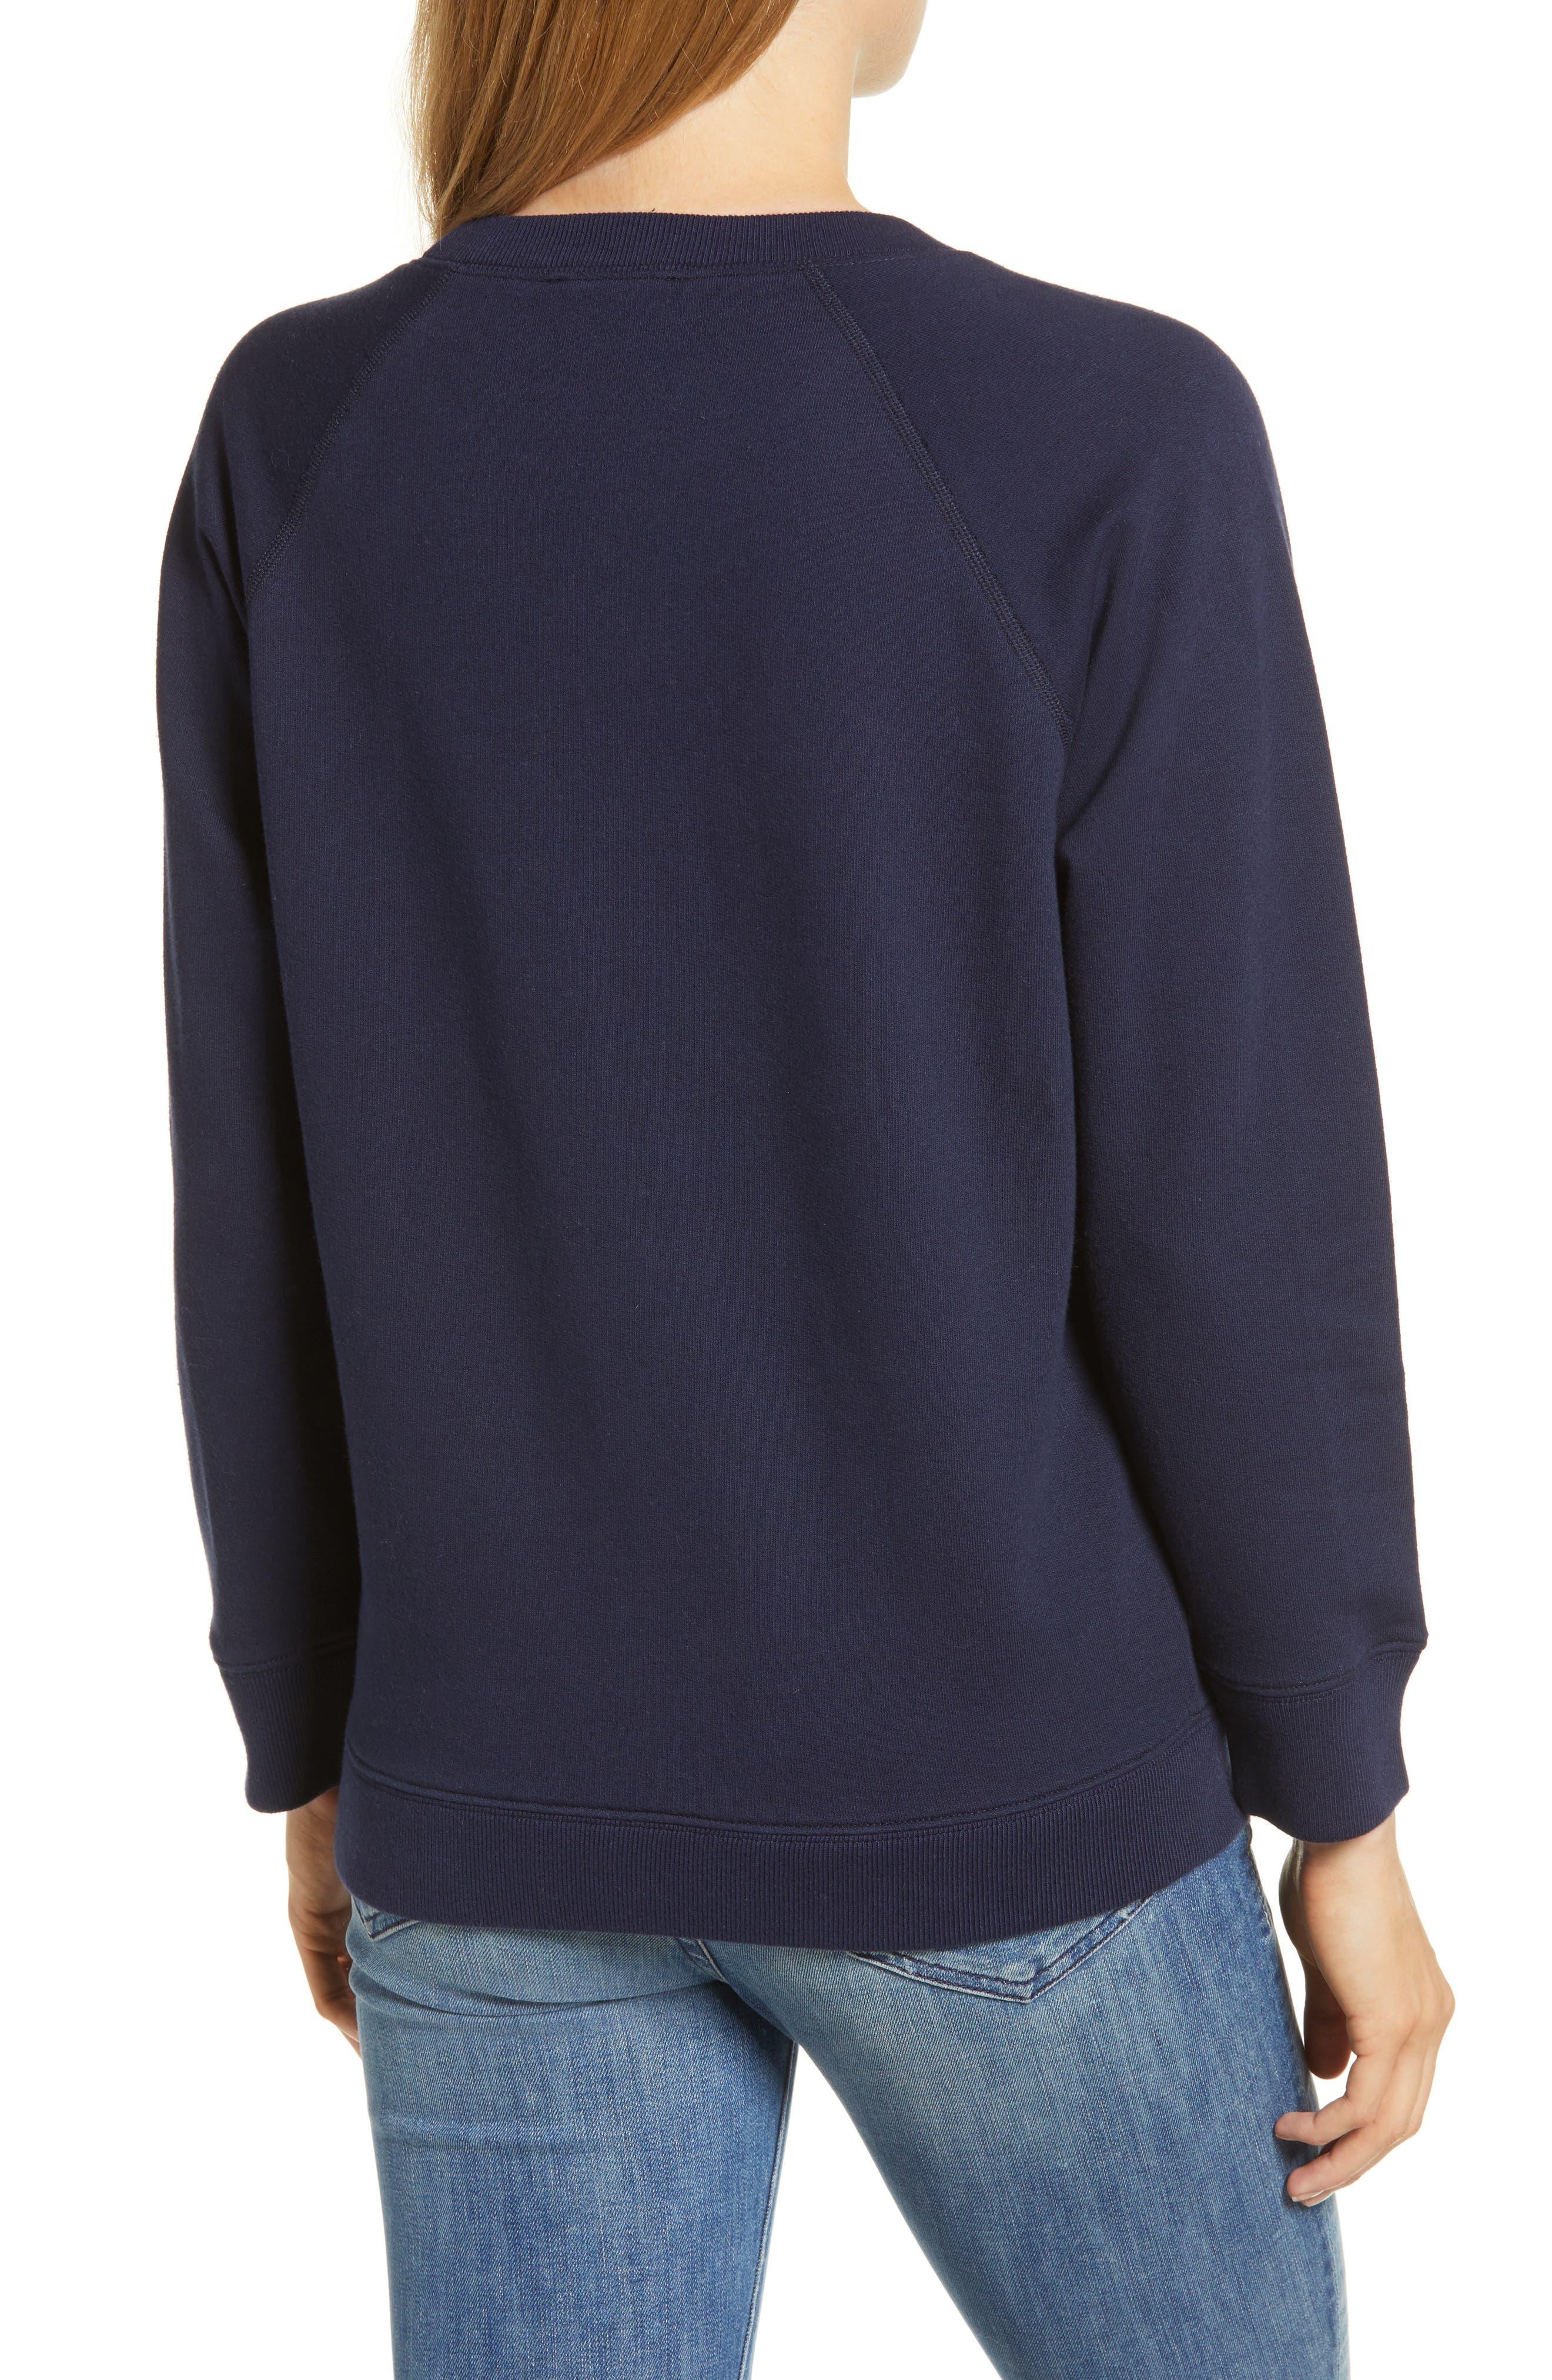 J.CREW, Champagne Sweatshirt, Alternate thumbnail 2, color, 400